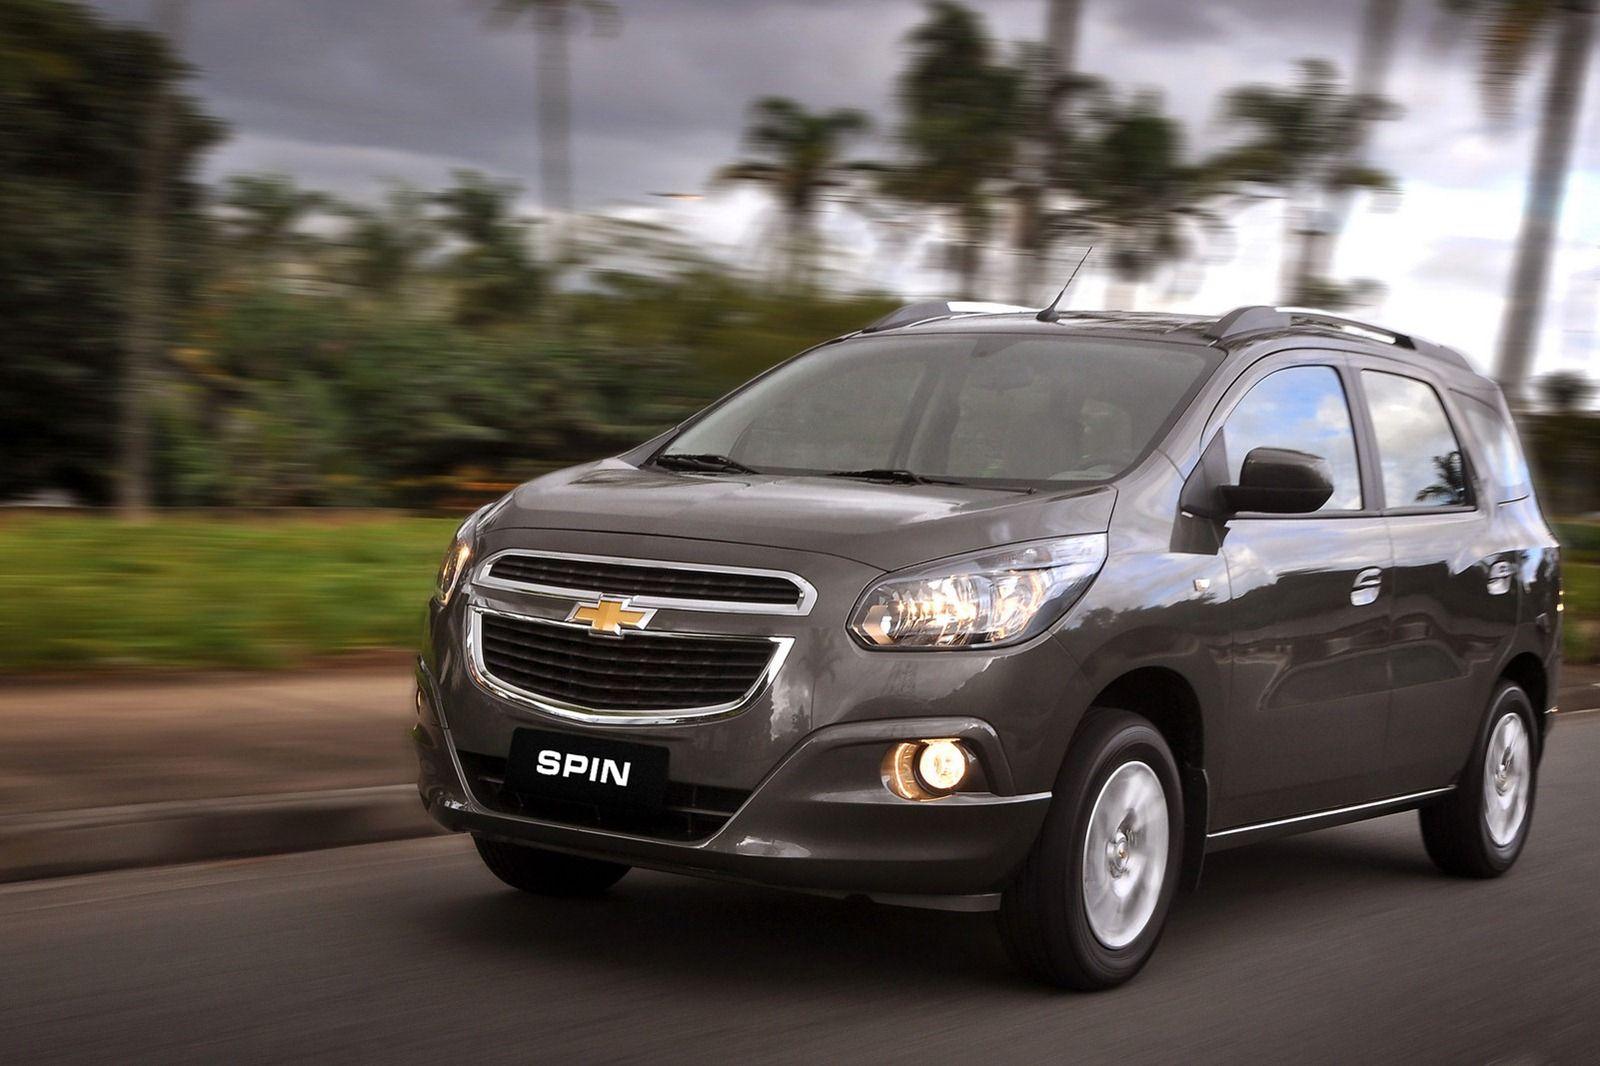 Chevrolet Spin Mpv Launched Hd Wallpaper Chevrolet Mobil Mpv Mobil